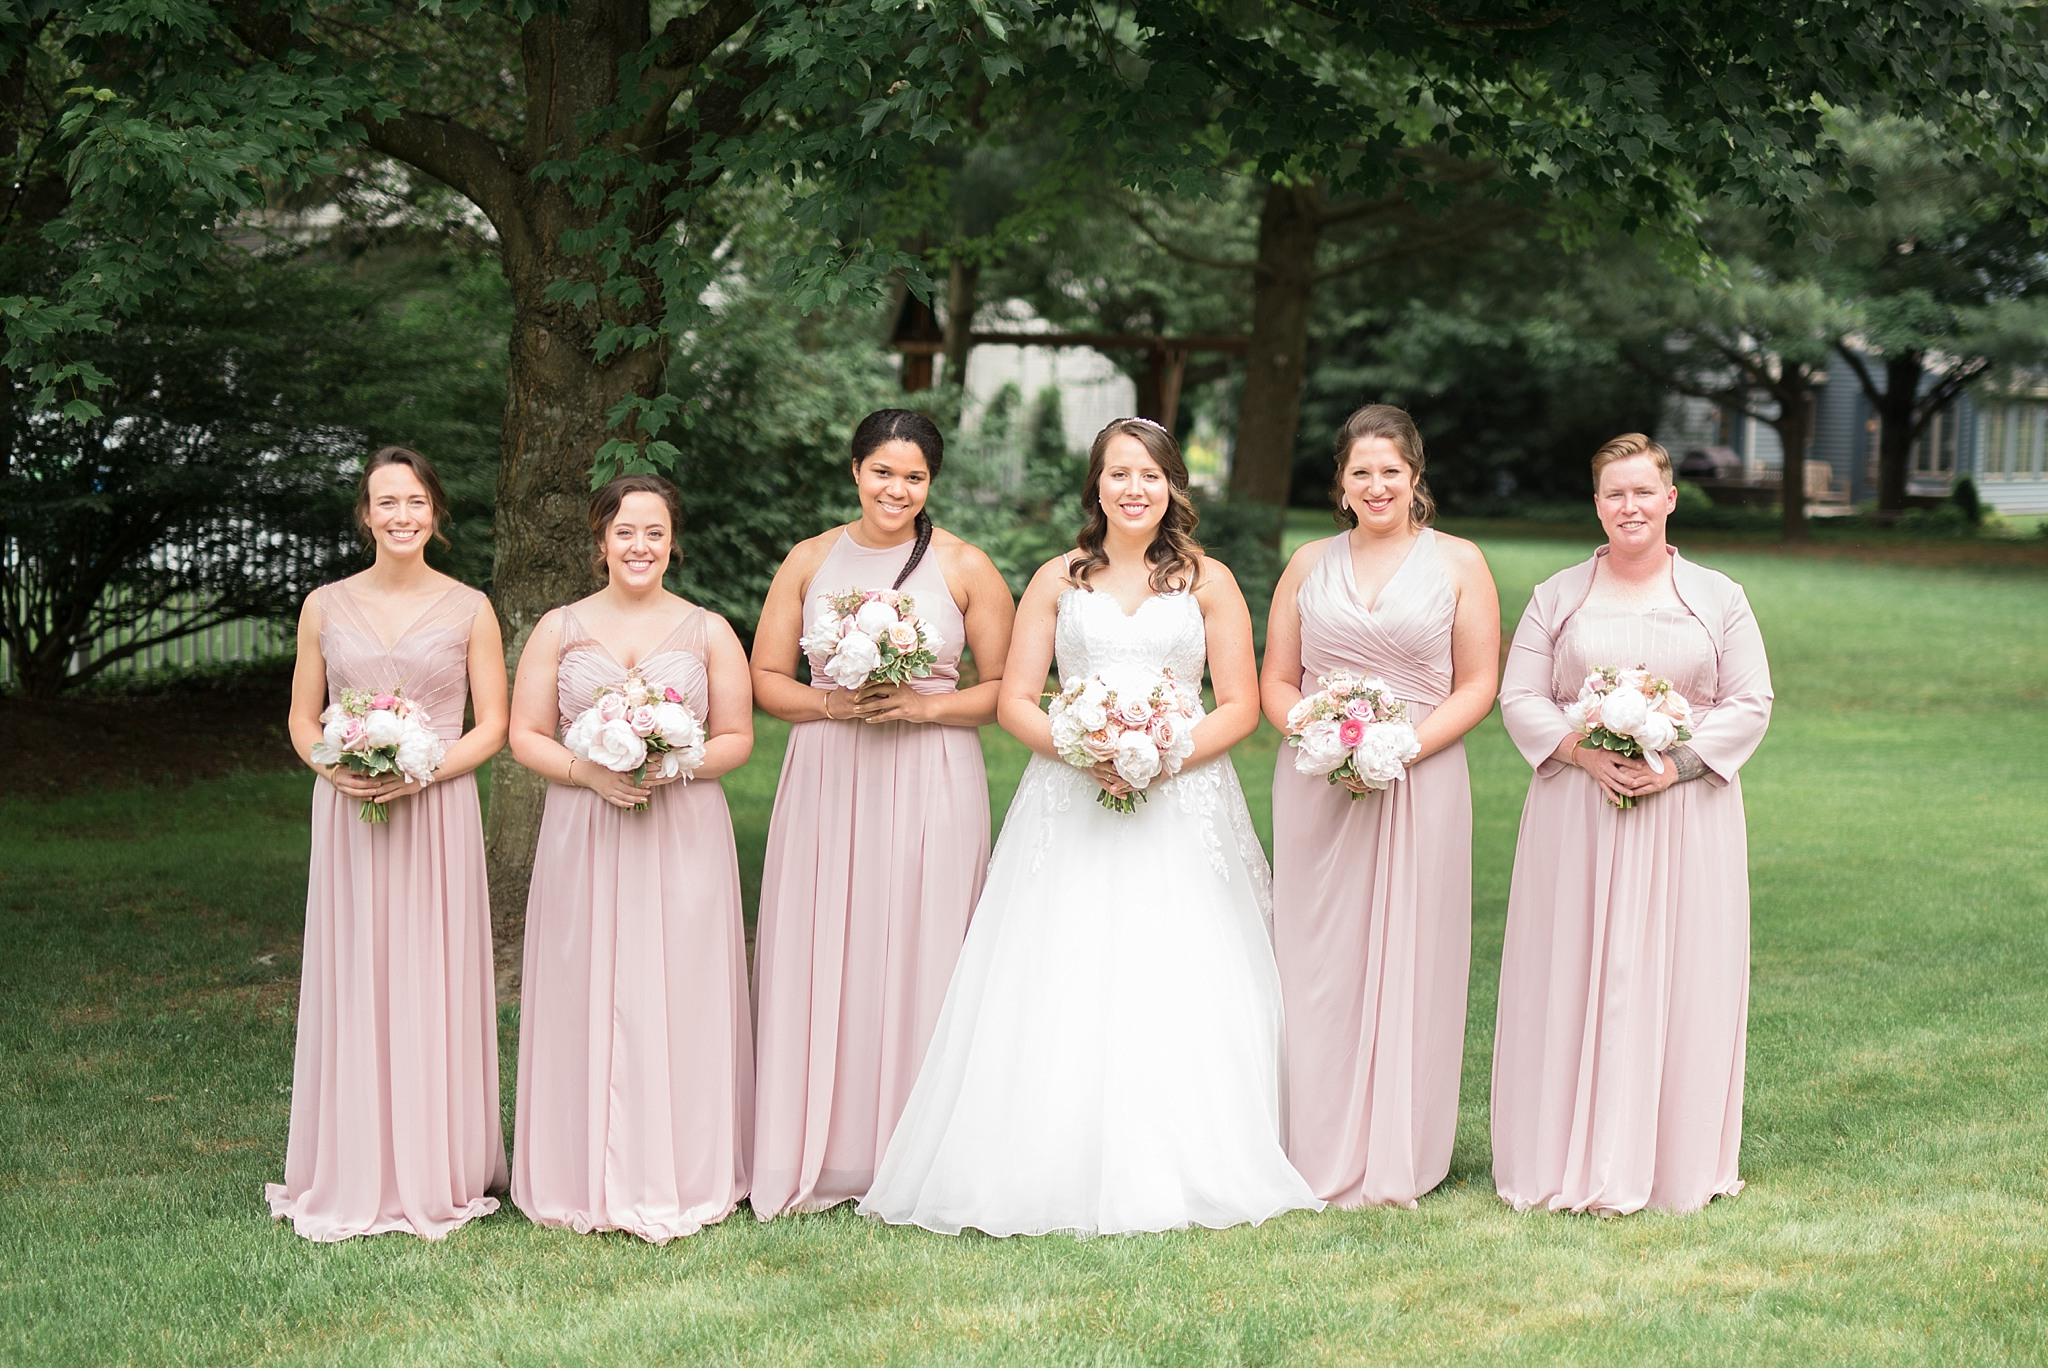 Bridesmaids and bride Hershey Gardens Hershey Country Club Summer beautiful wedding photography_1567.jpg